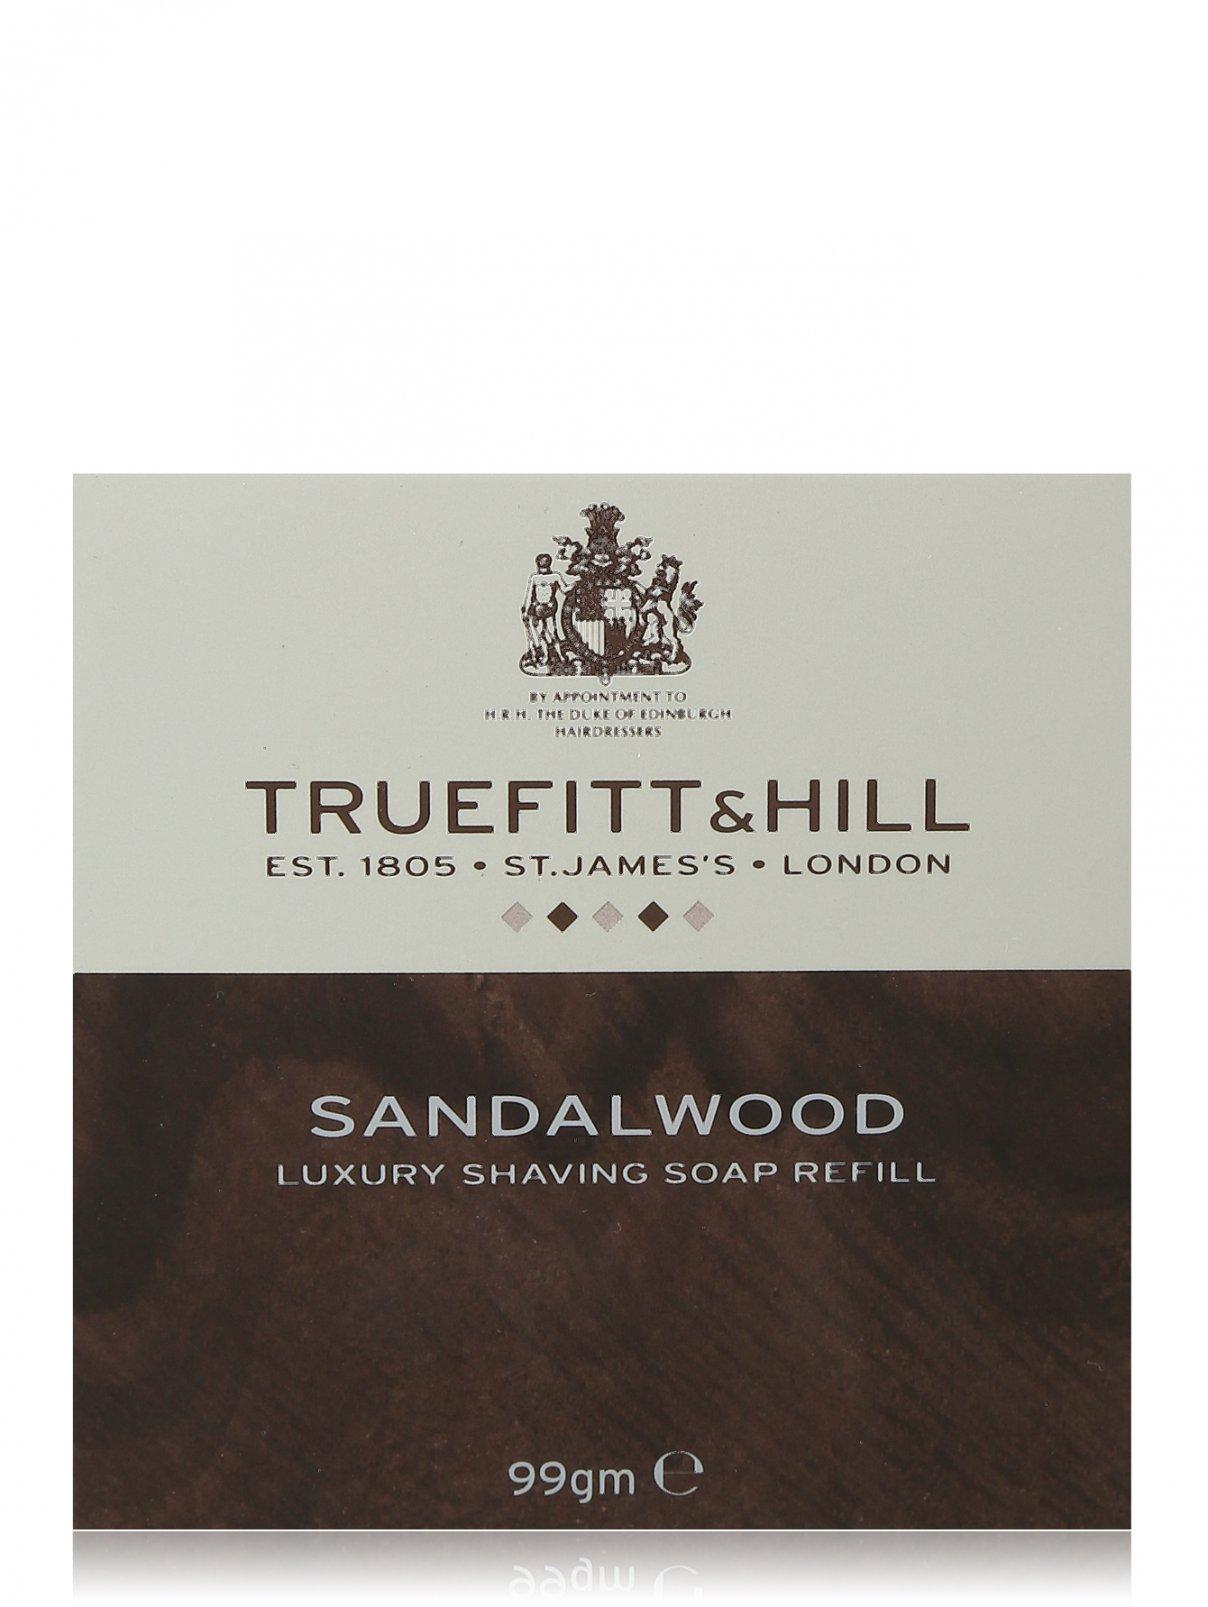 Люкс-мыло для бритья Truefitt & Hill  –  Общий вид